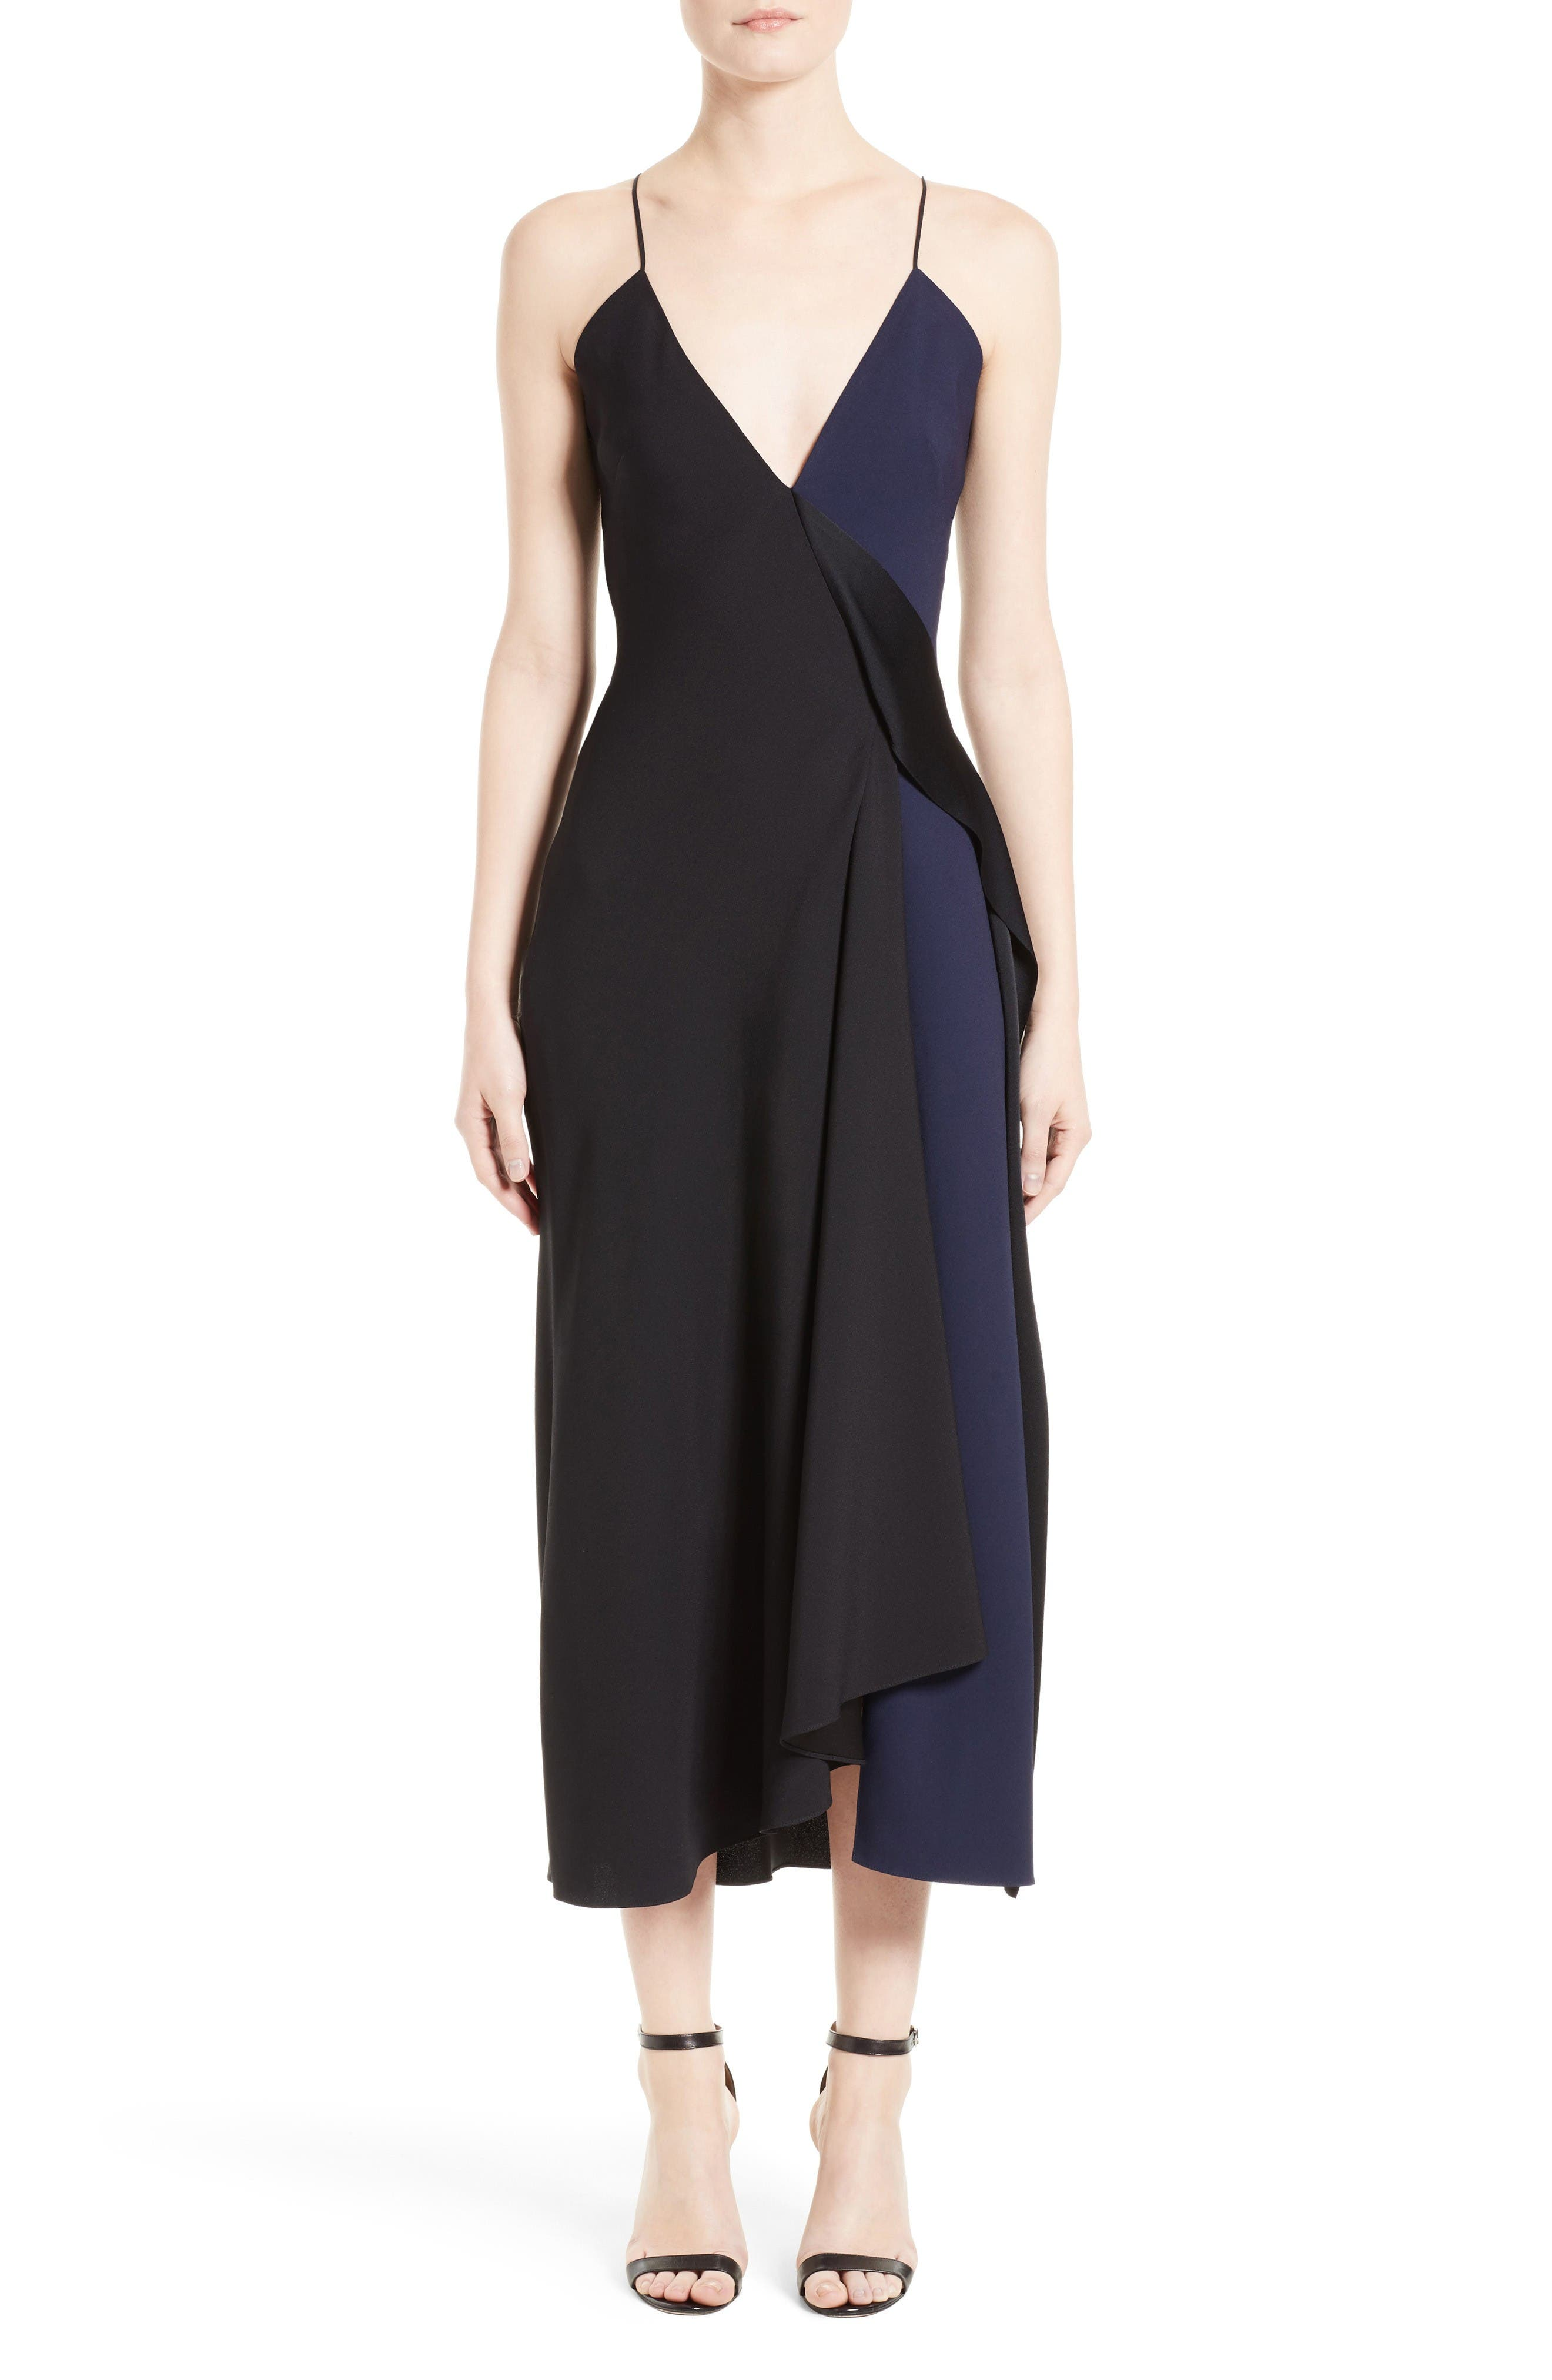 Main Image - Victoria Beckham Asymmetrical Camisole Dress